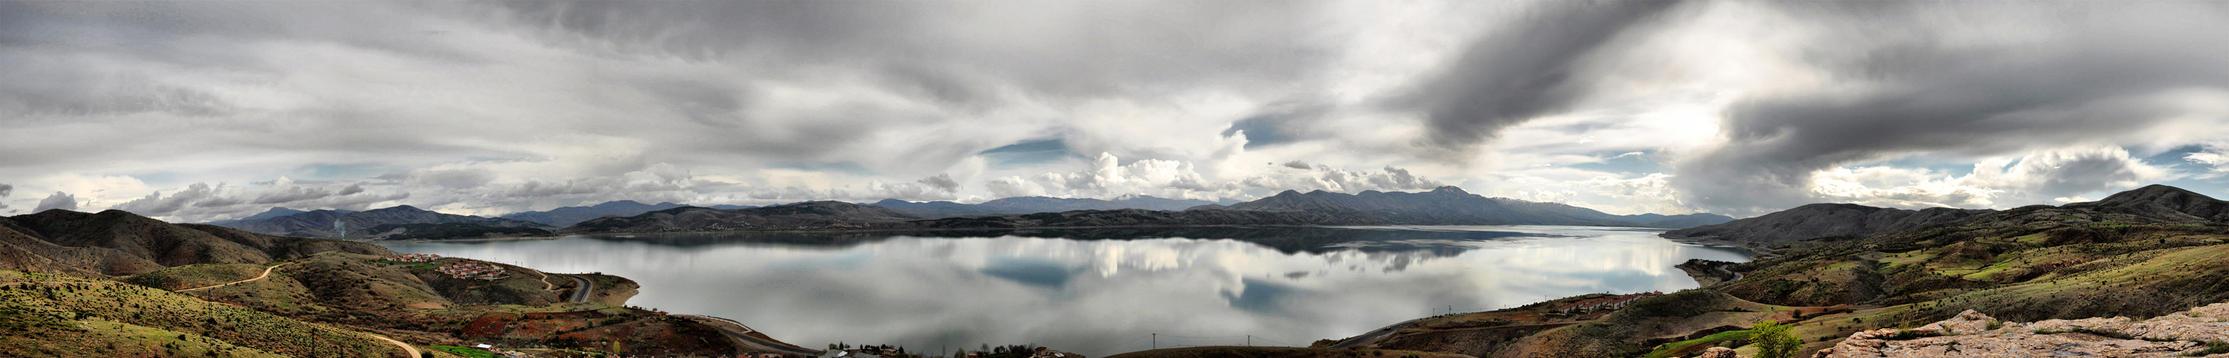 Lake 2 by inankilic